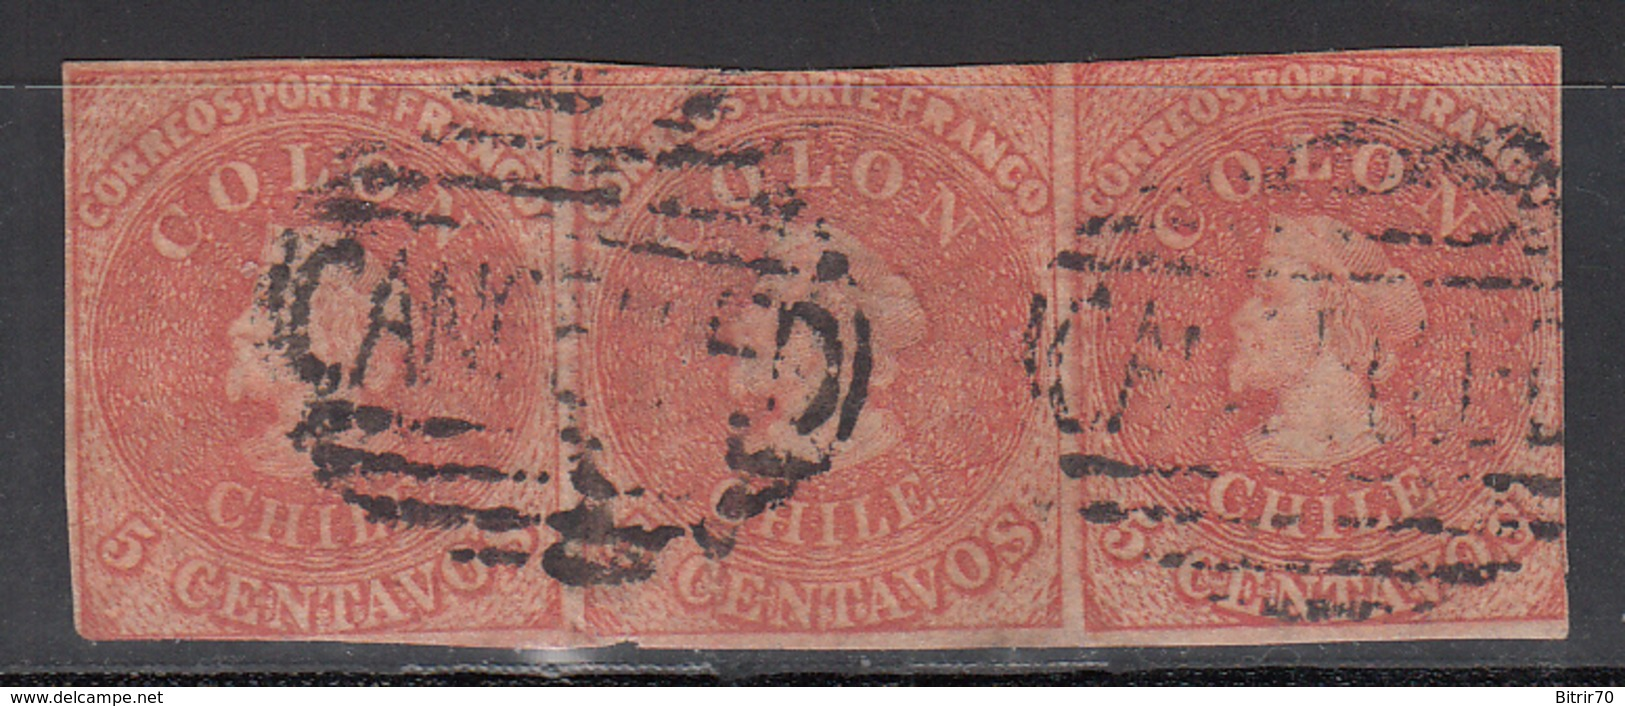 1856-66  Yvert Nº 5c, Carmin. - Chile